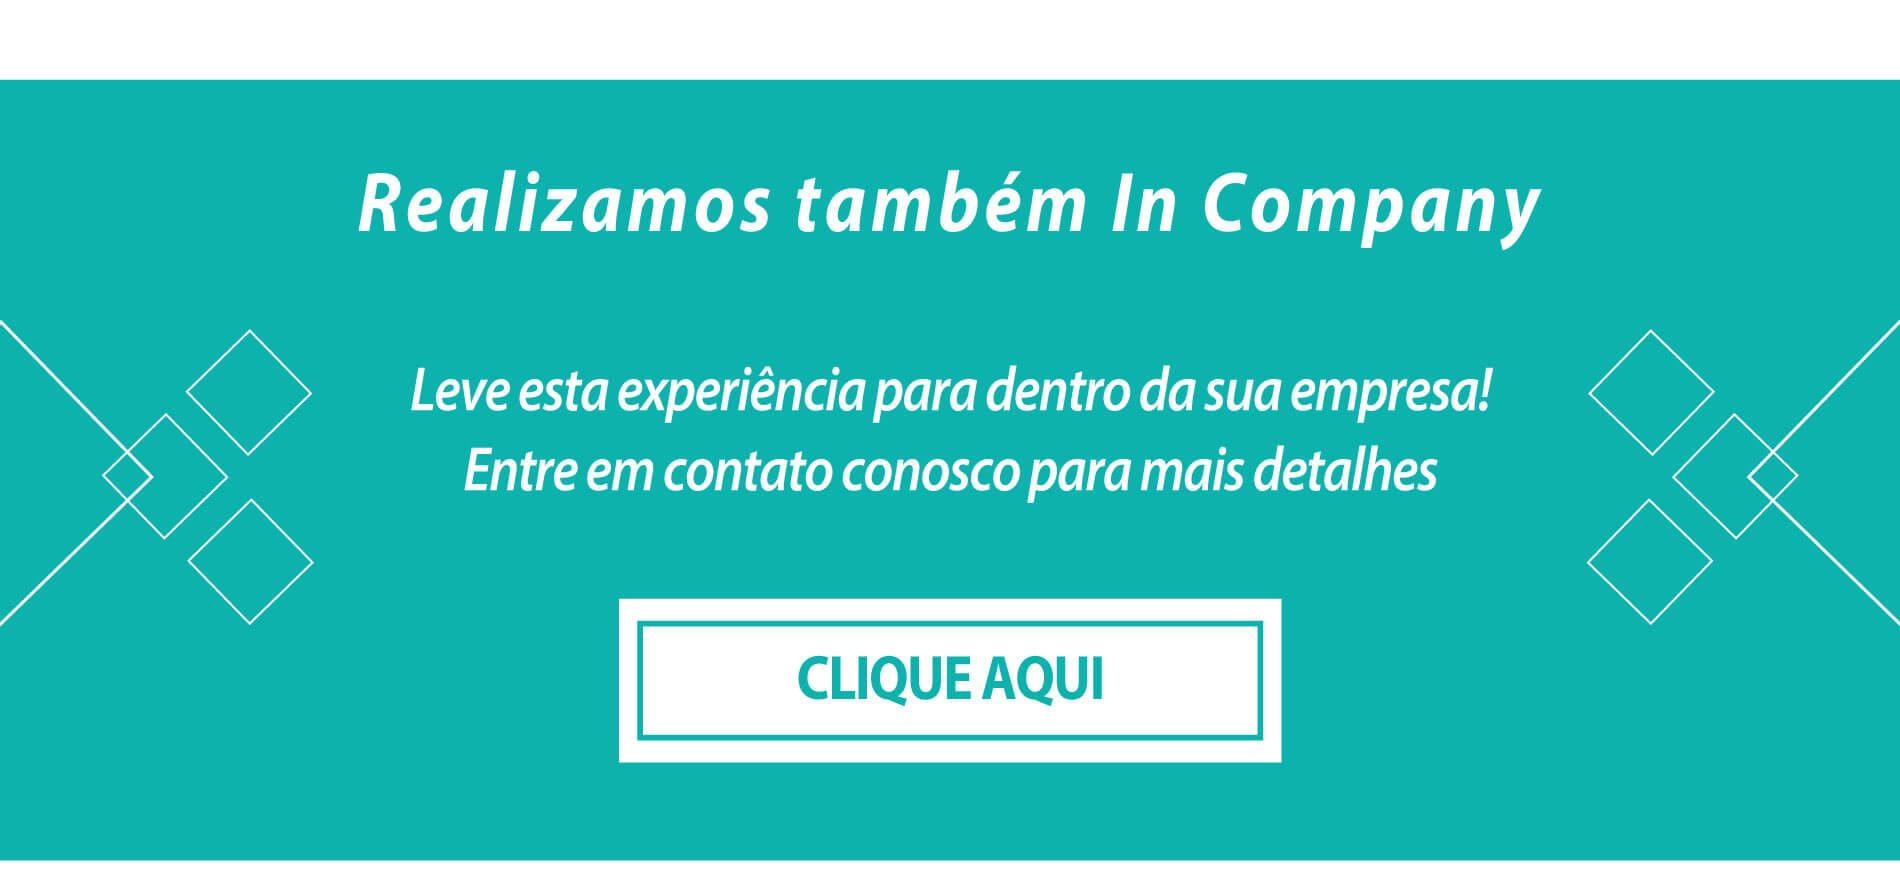 https://www.mestregp.com.br/wp-content/uploads/2018/02/Pagina-CdE-Design-Thinking-b-incompany-1900x878.jpg